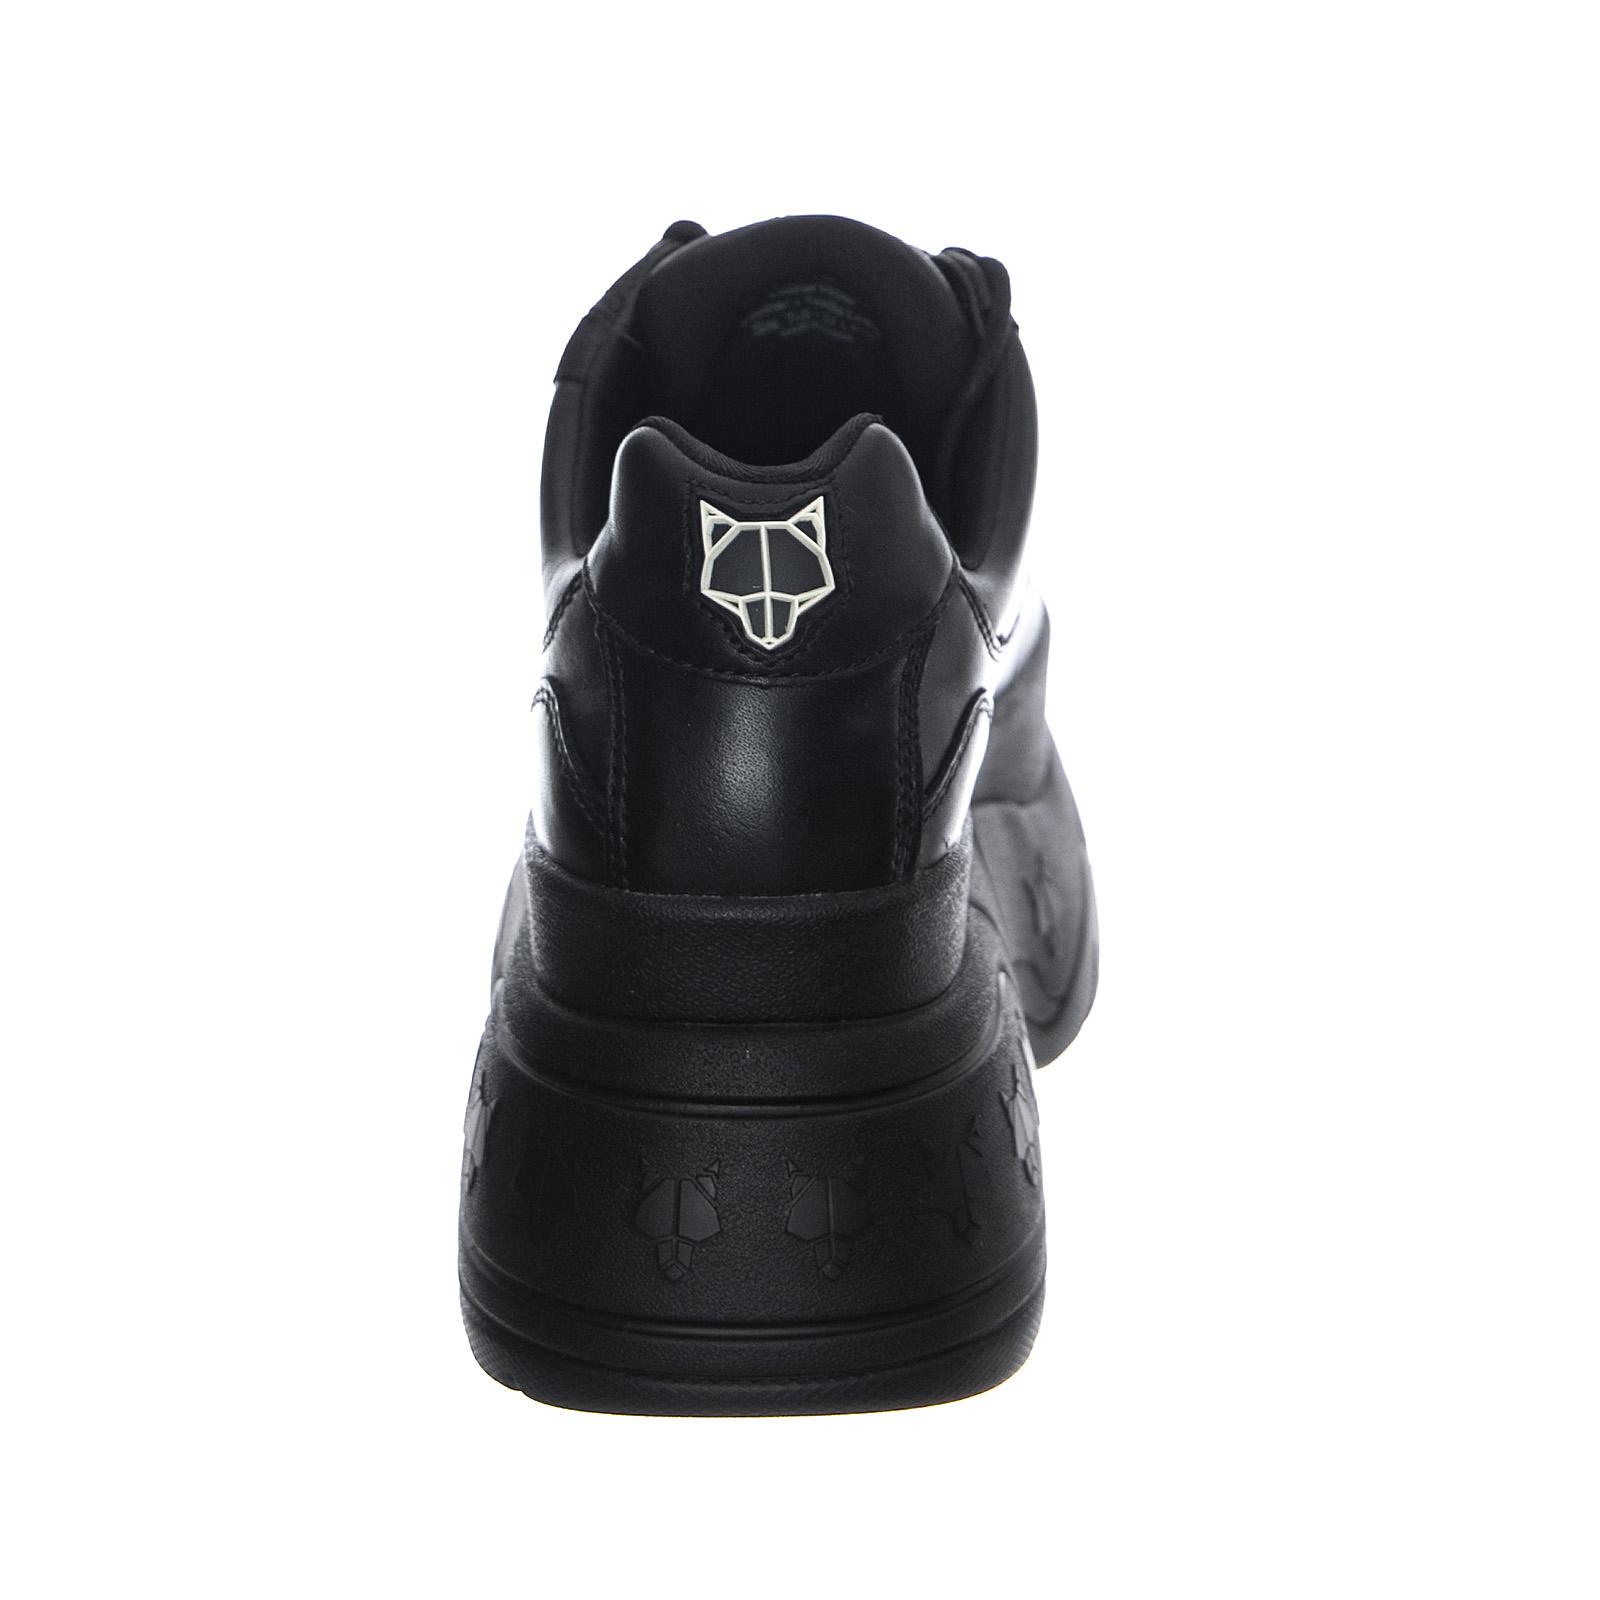 Naked Wolfe Patent Platform Low Top Sneakers In Black